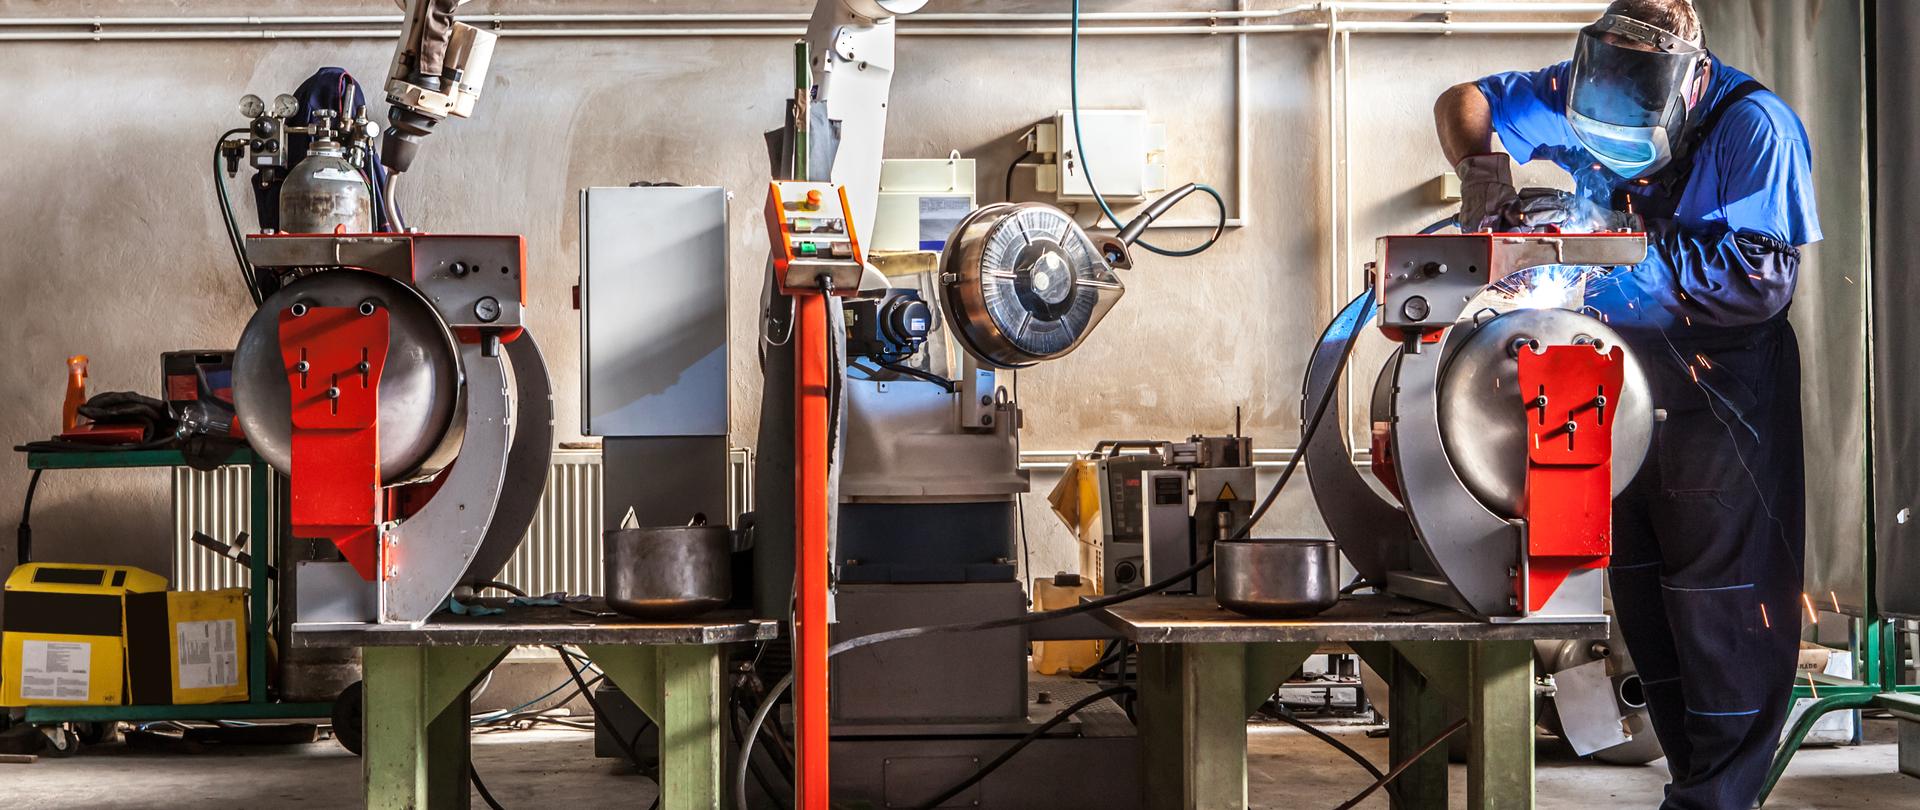 Tackling the UK's manufacturing skills gap